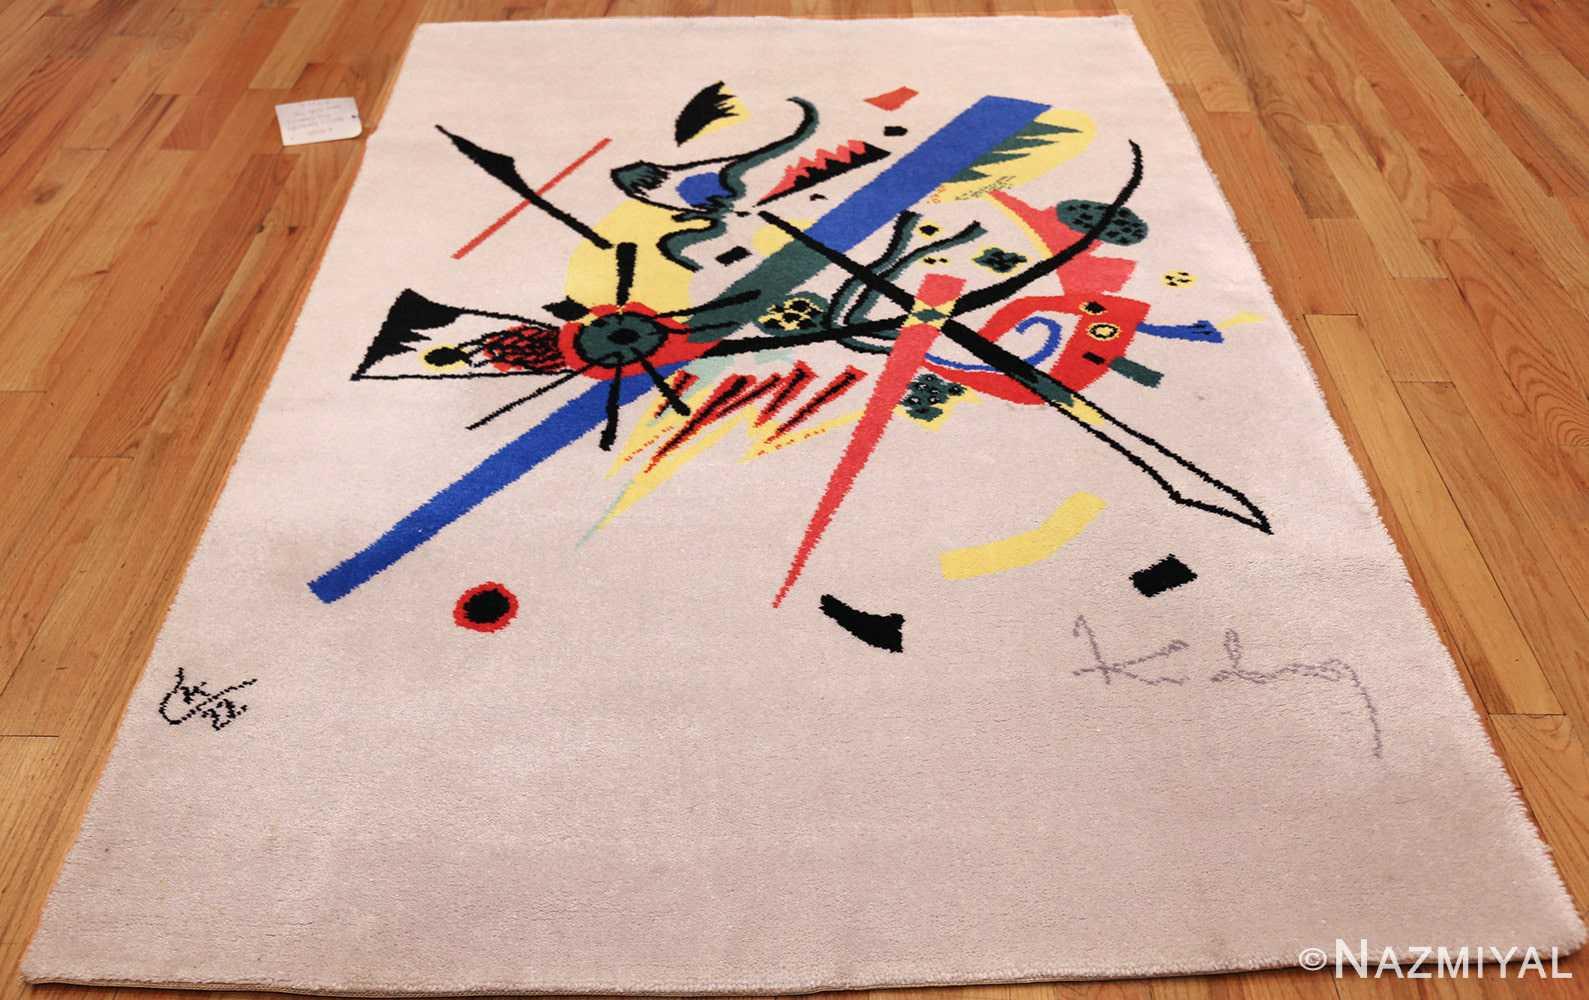 bauhaus rug inspired by kandinsky small worlds 47388 whole edited Nazmiyal